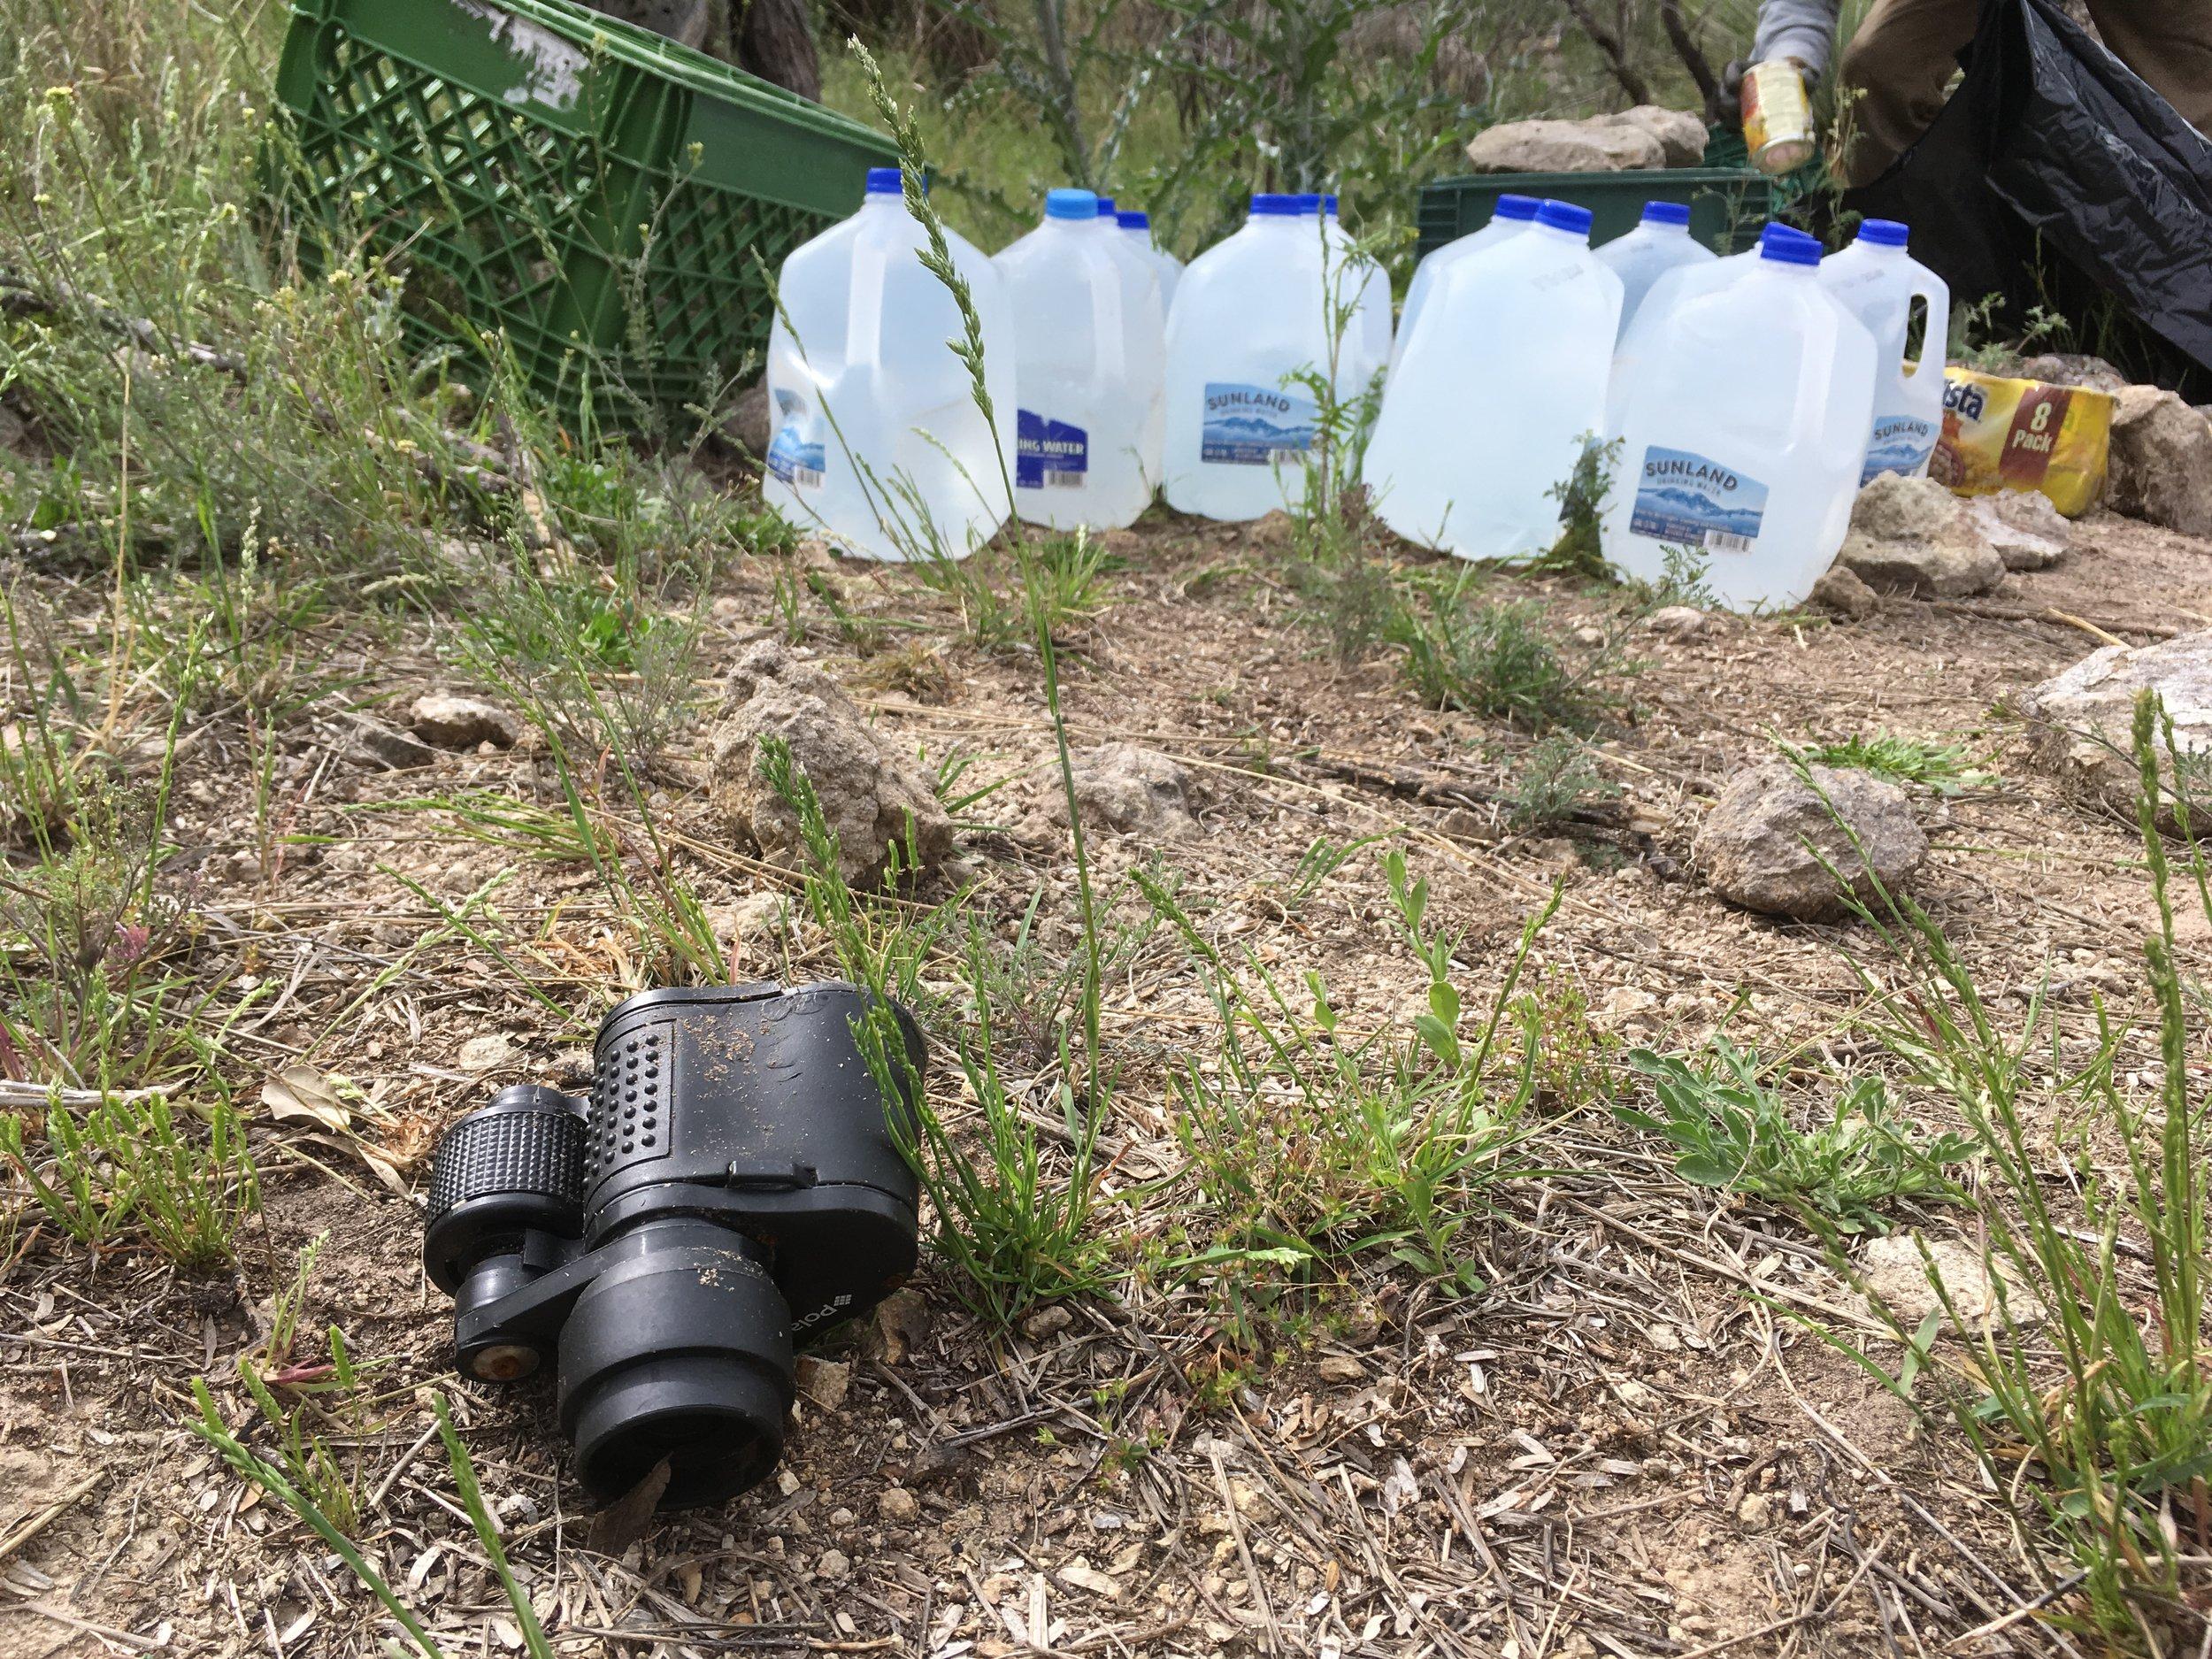 Broken binoculars abandoned at a drop point